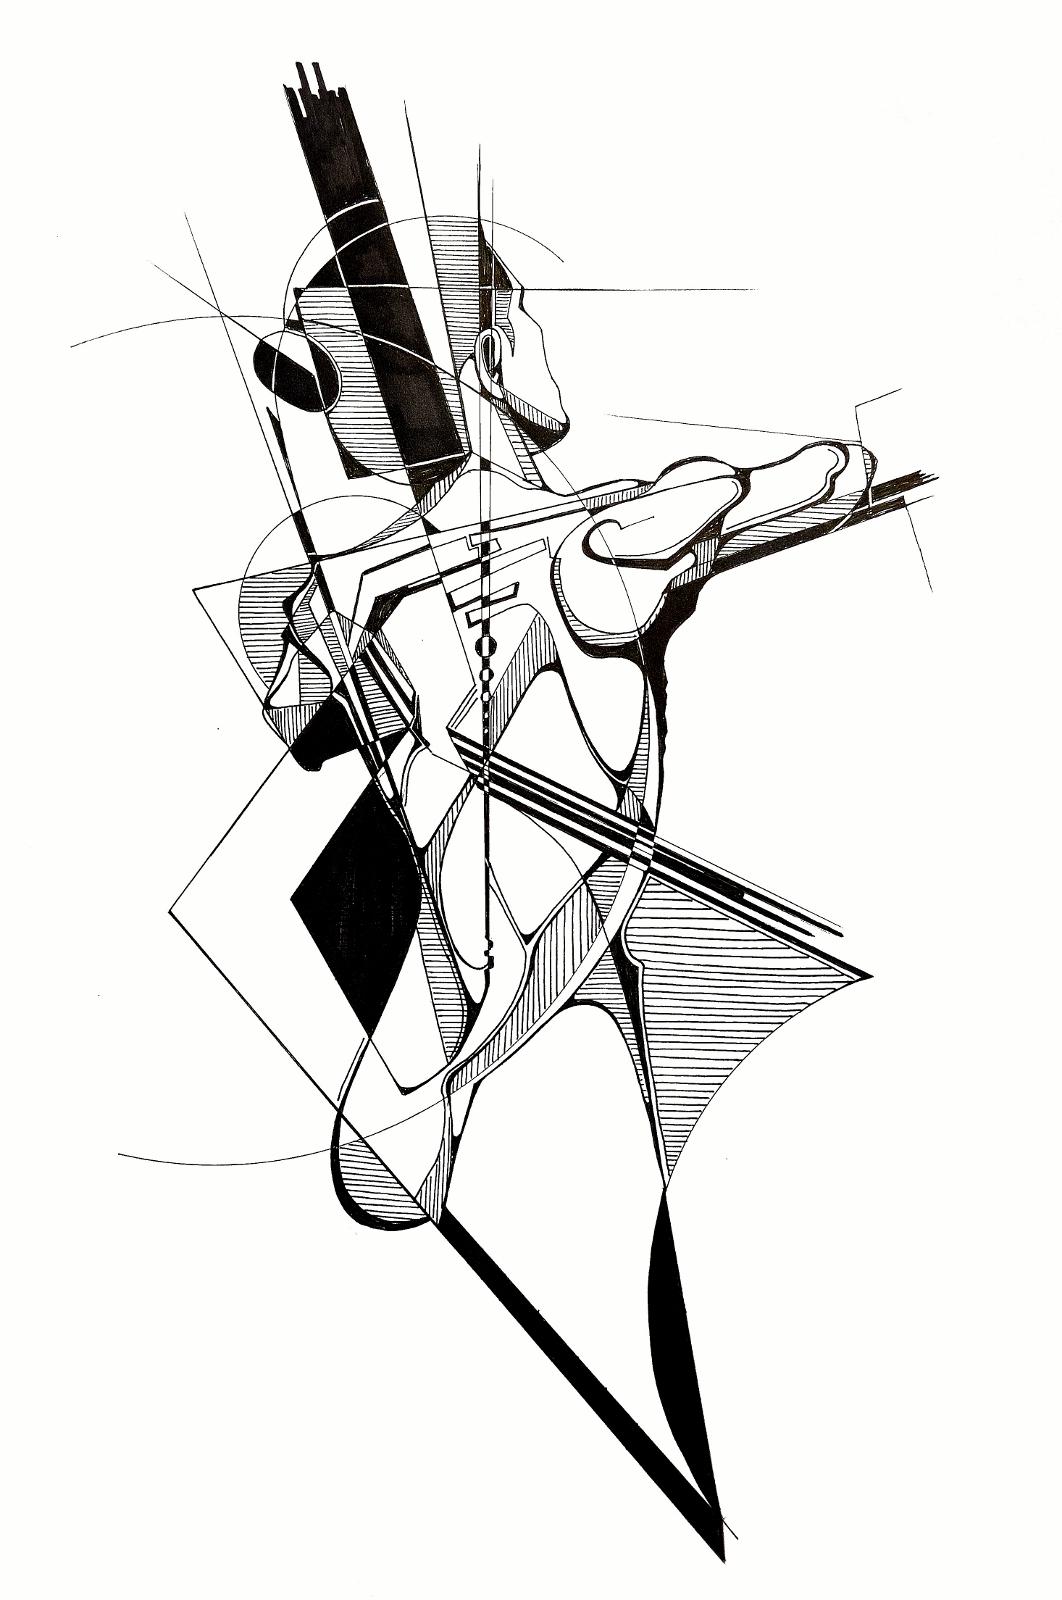 Piotr hand drawing (1062x1600).jpg